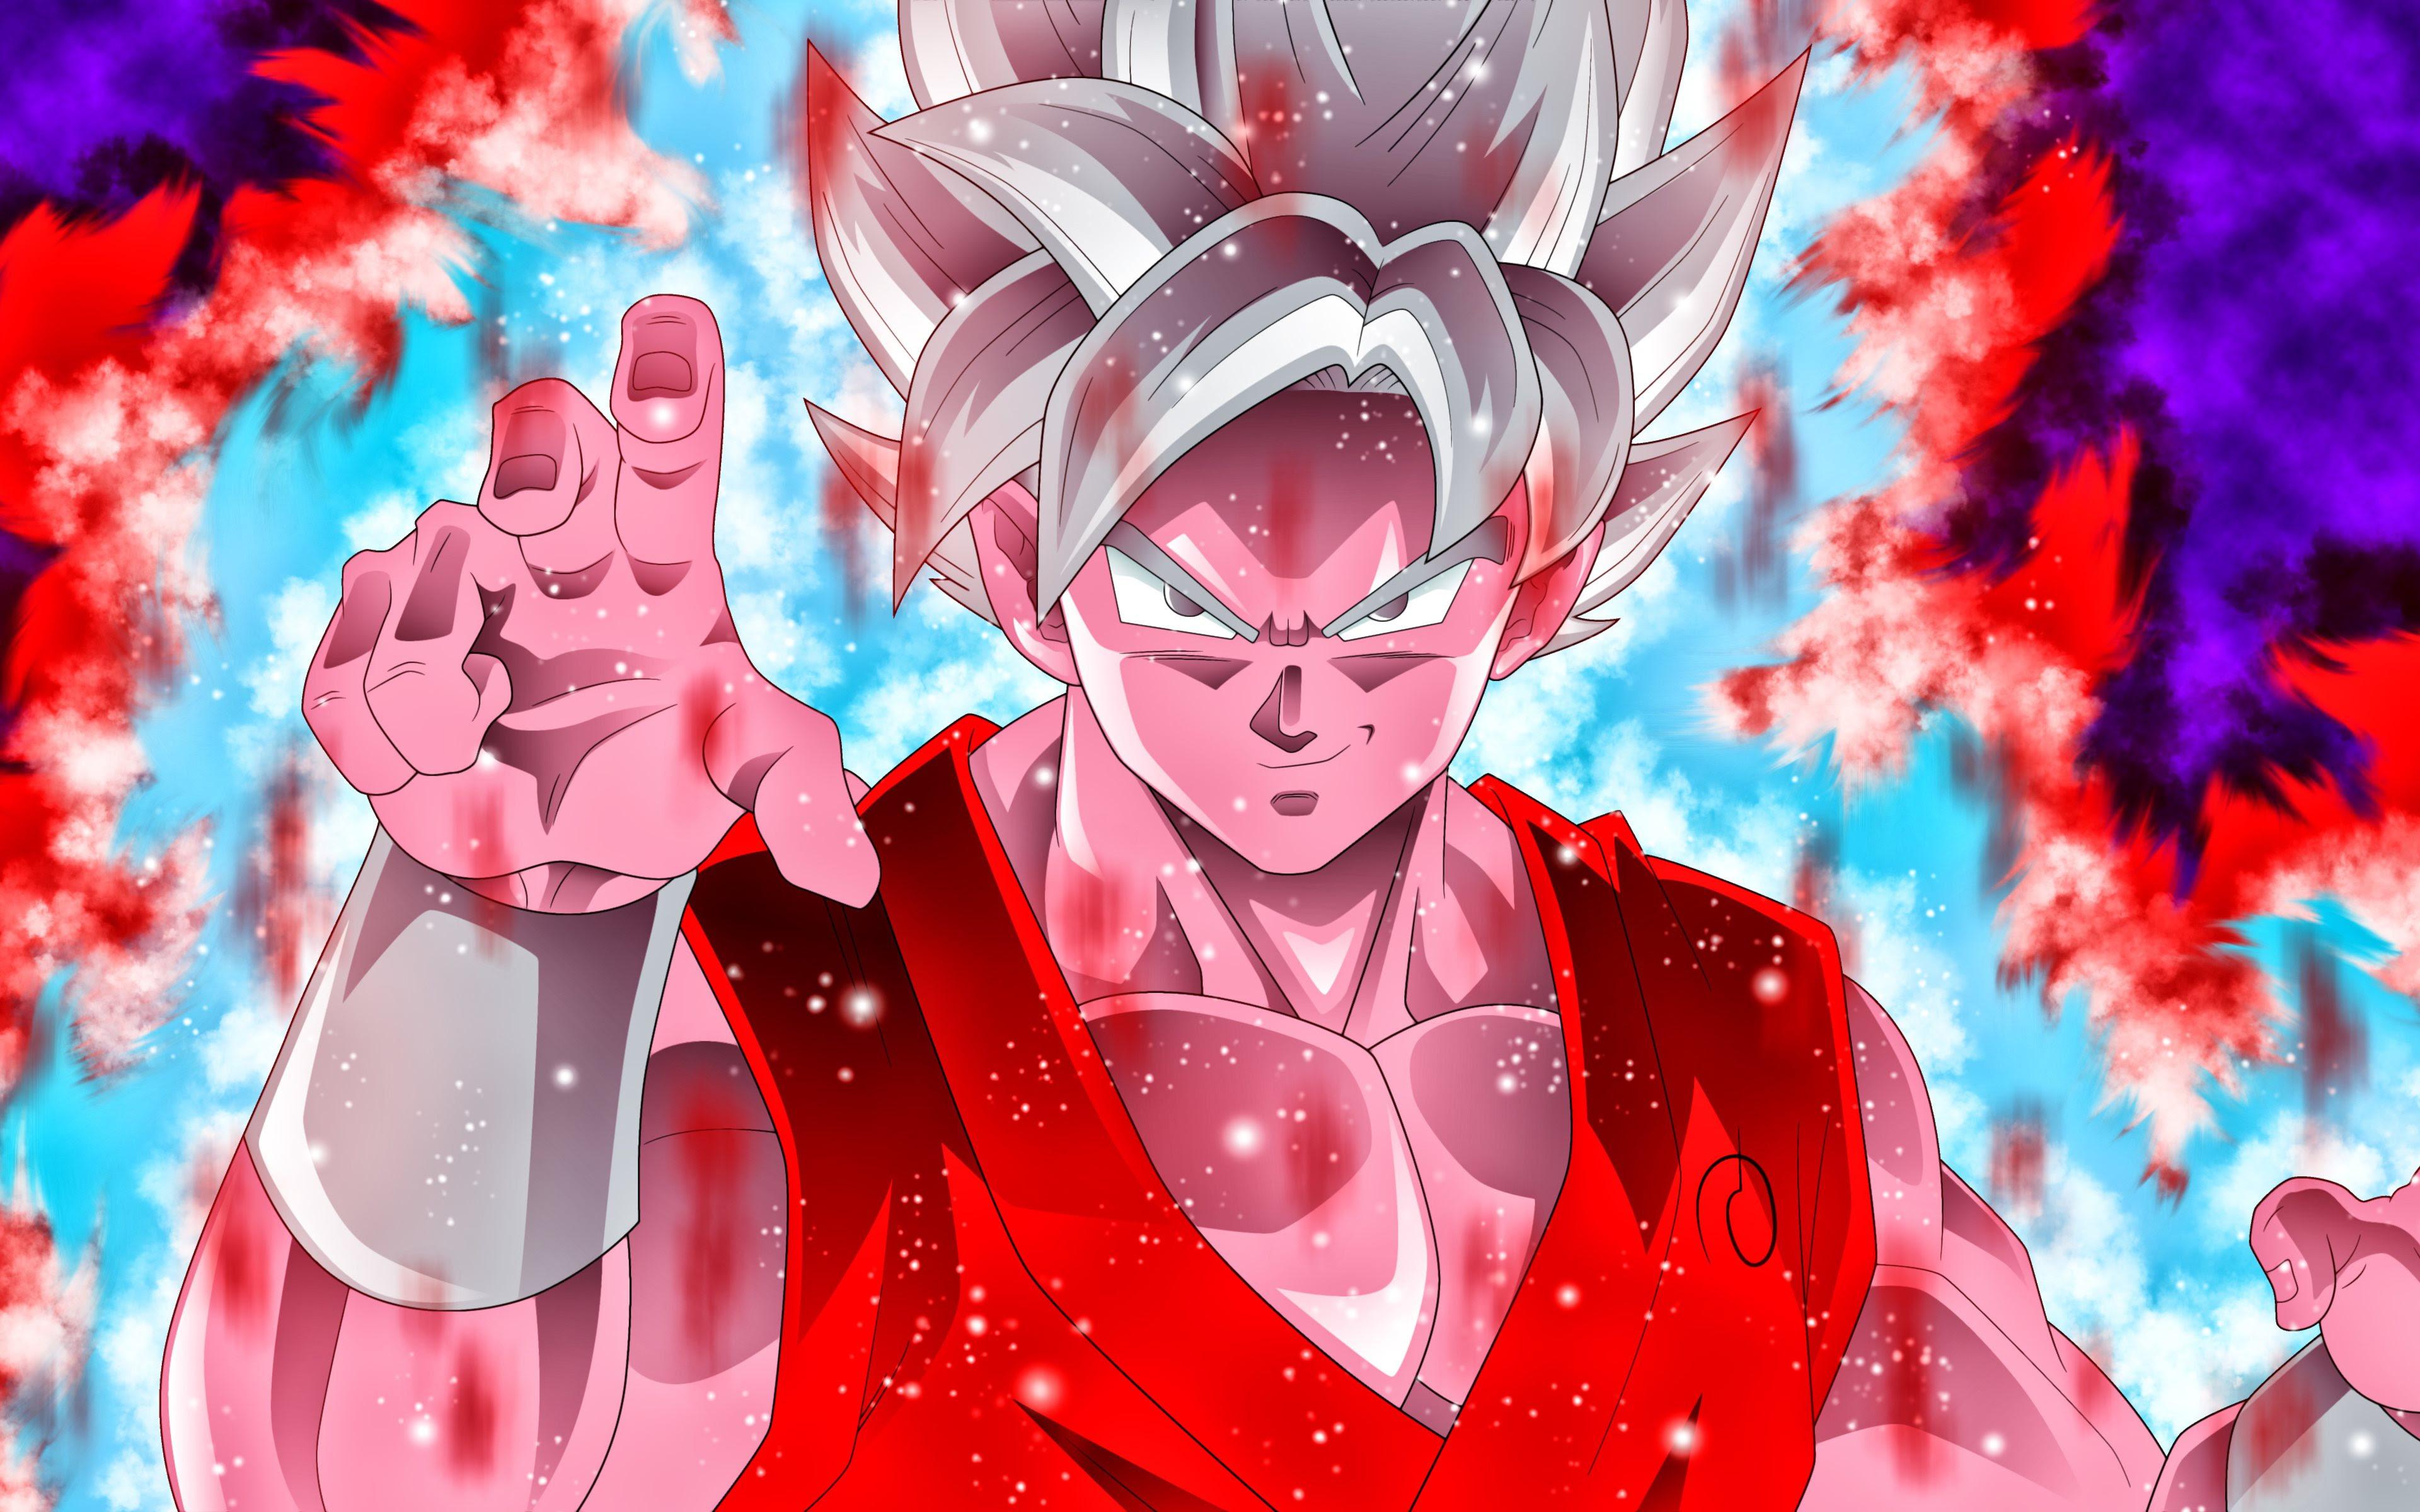 Download Wallpapers Ultra Instinct Goku Colorful Fire Dbs 4k